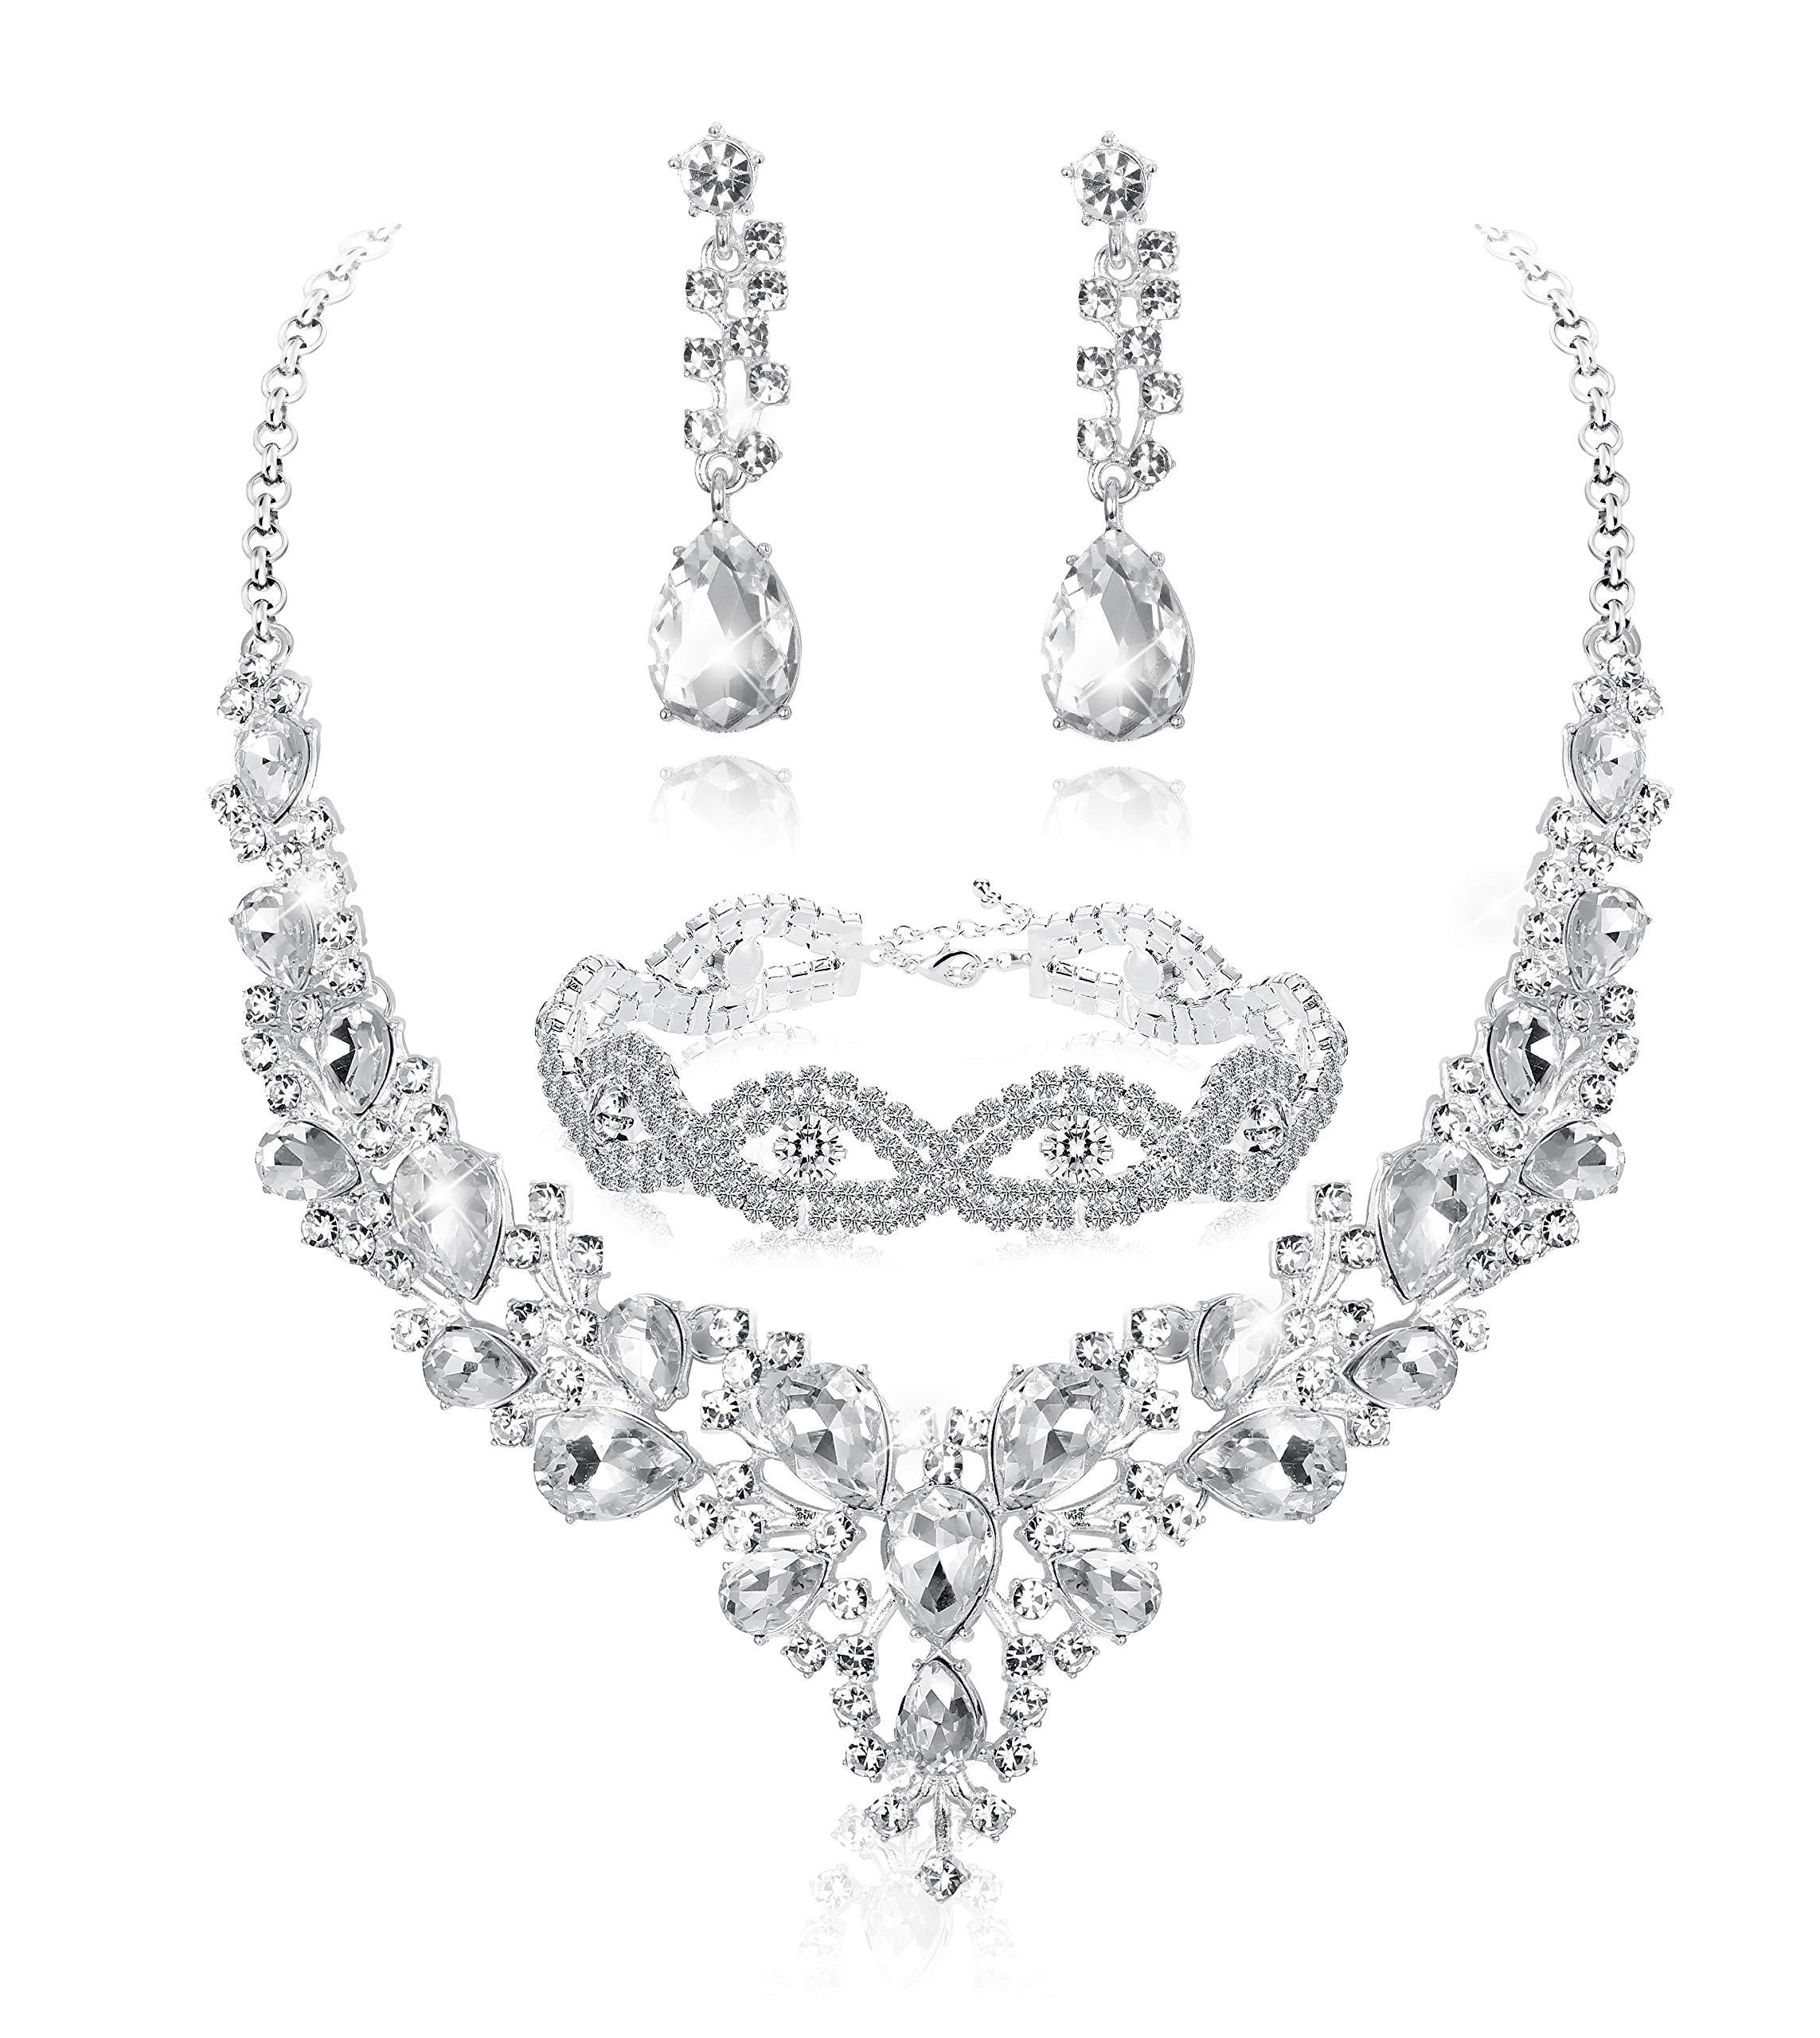 Fiasaso 3 PCS Crystal Bridal Jewelry Set for Women Rhinestone Necklace Earrings Bracelet Wedding Bridesmaid by Fiasaso